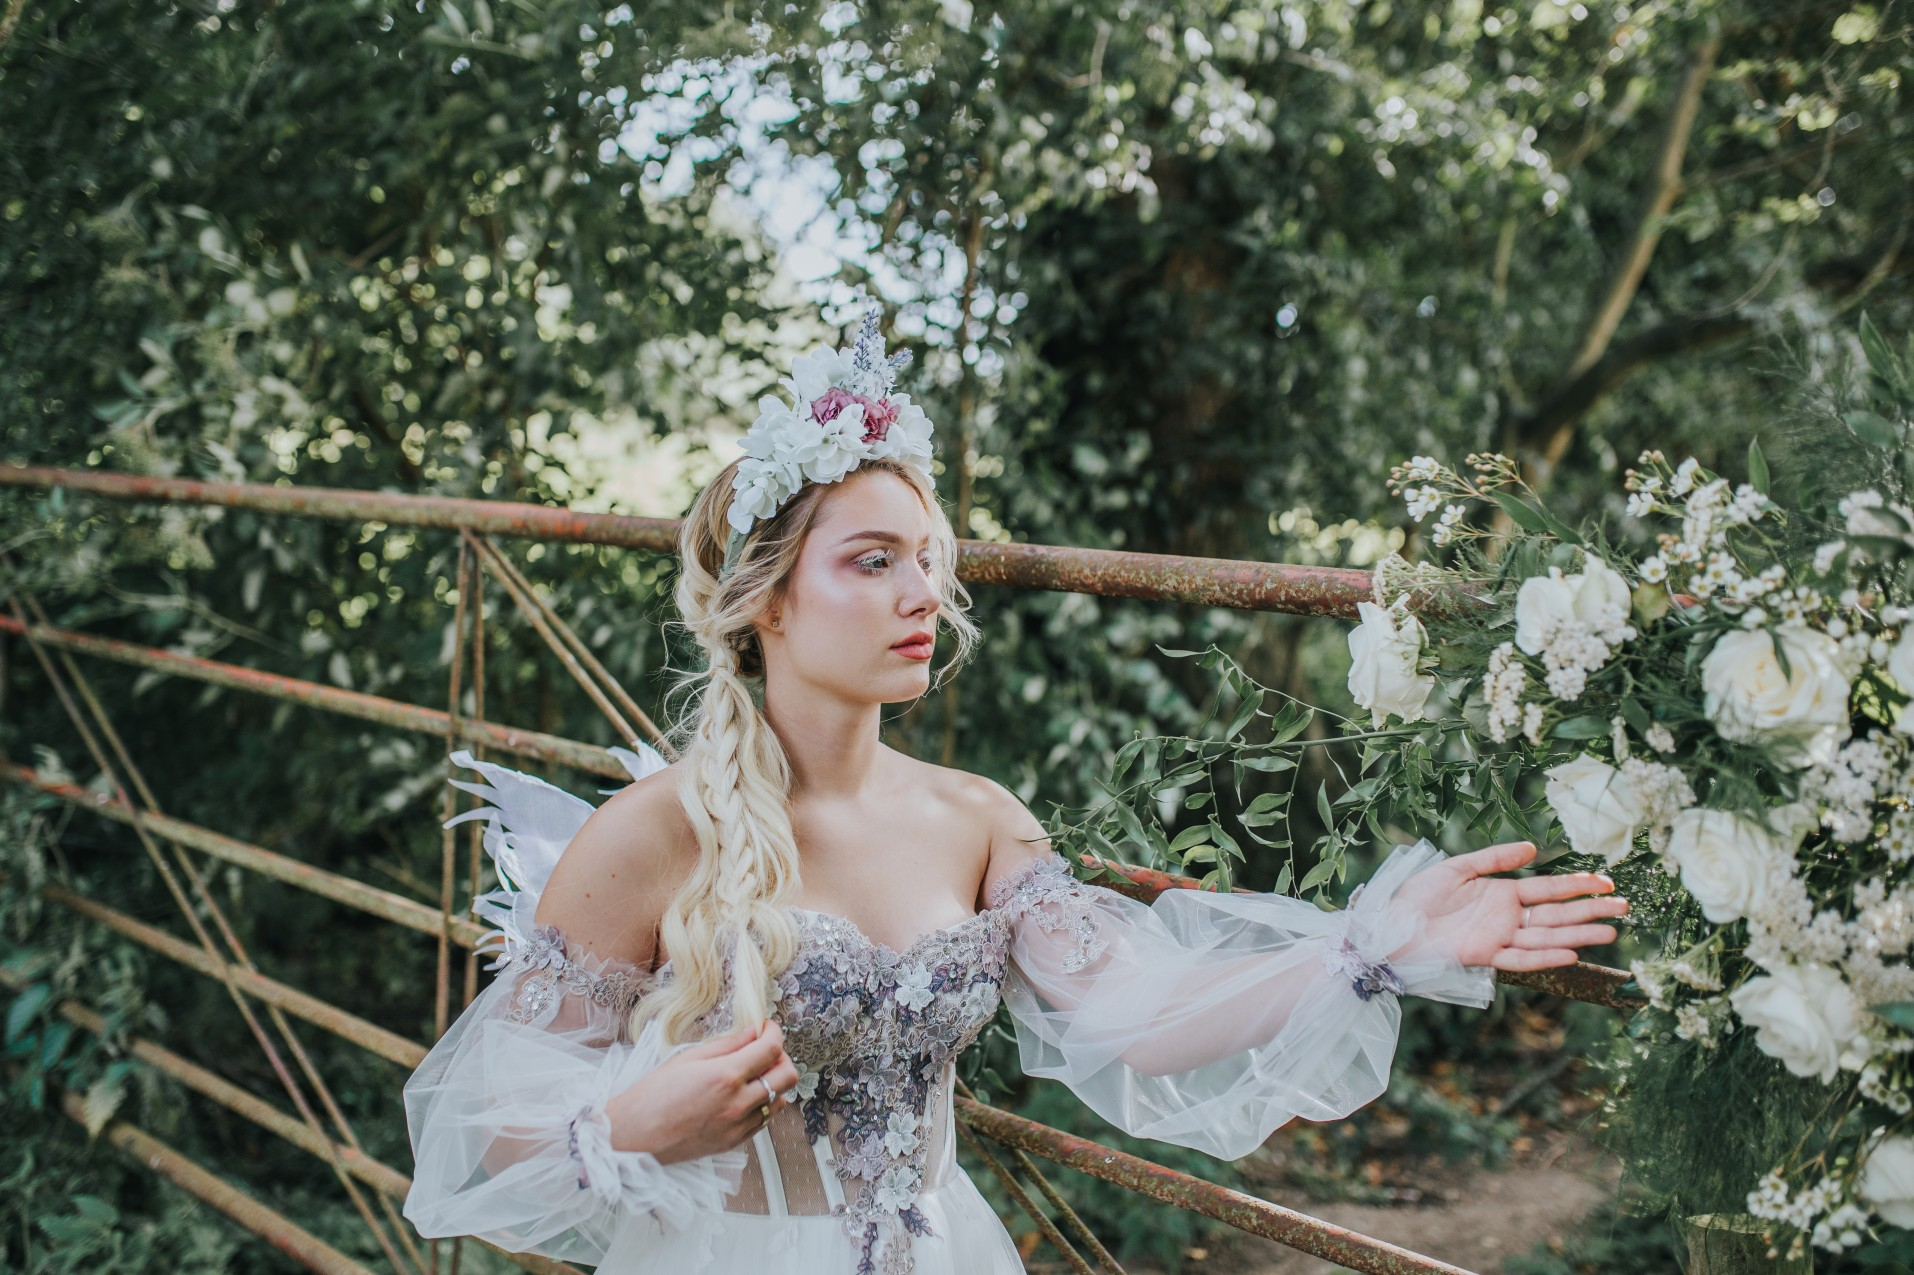 fairy wedding - whimsical wedding - magical wedding - elegant wedding dress - unique wedding headdress - unique fairytale wedding dress